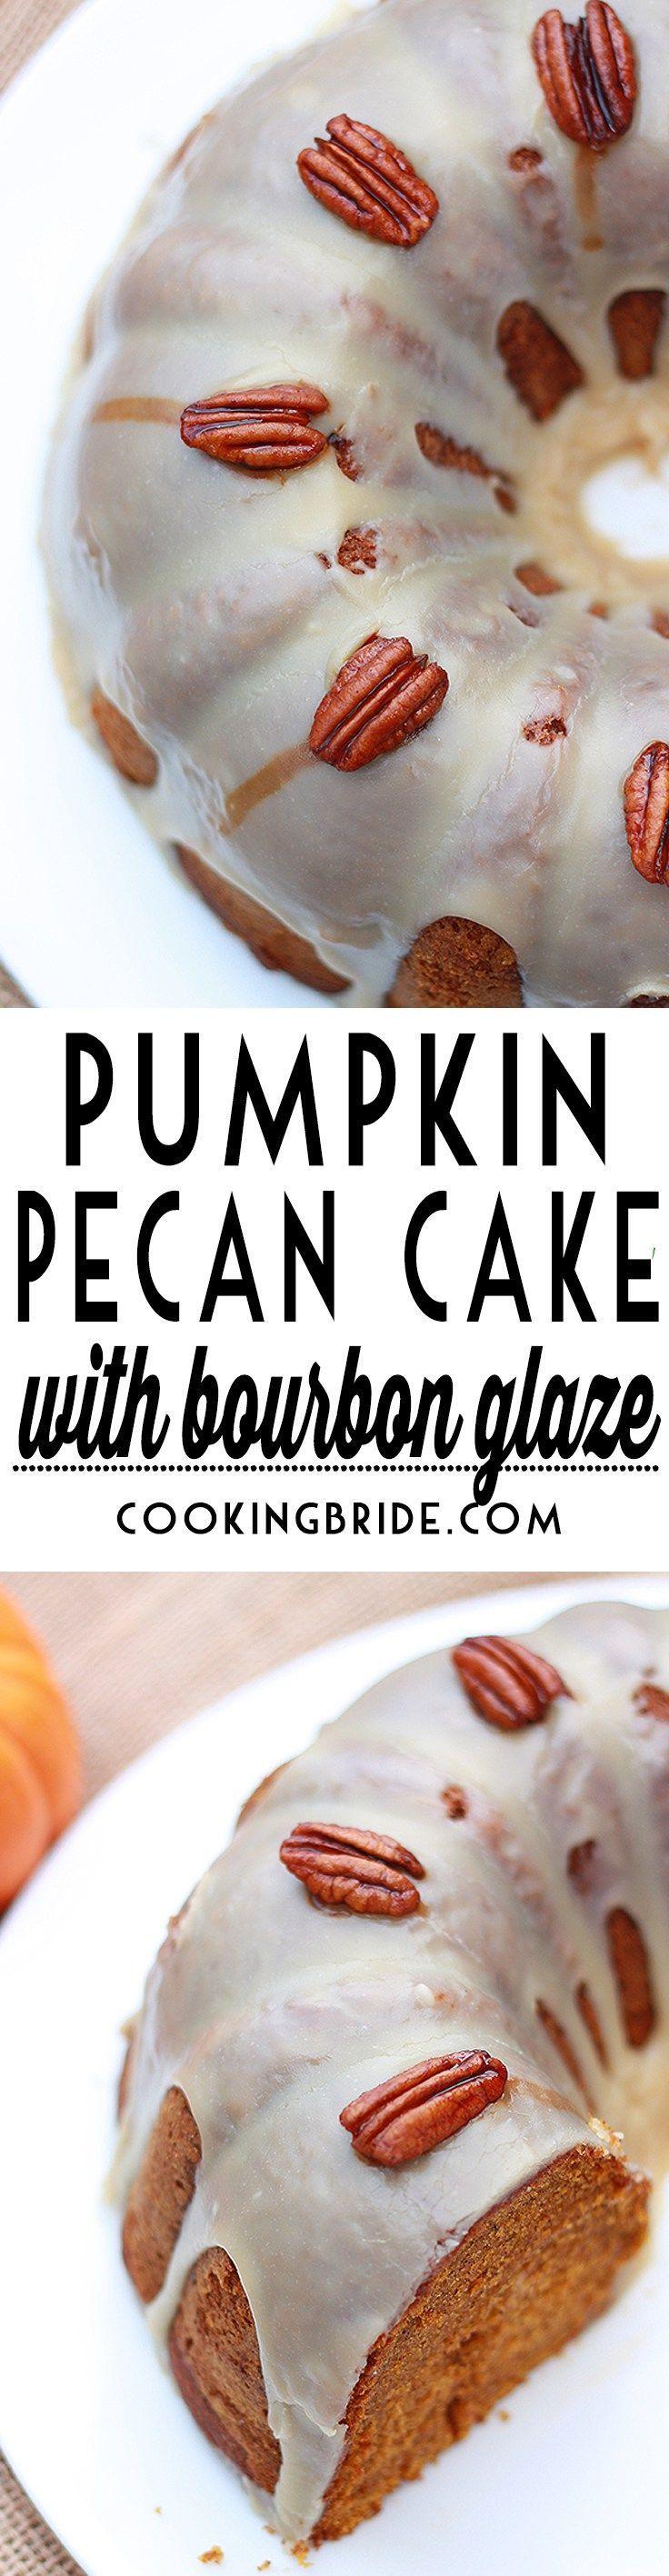 235 best Pumpkin Recipes images on Pinterest